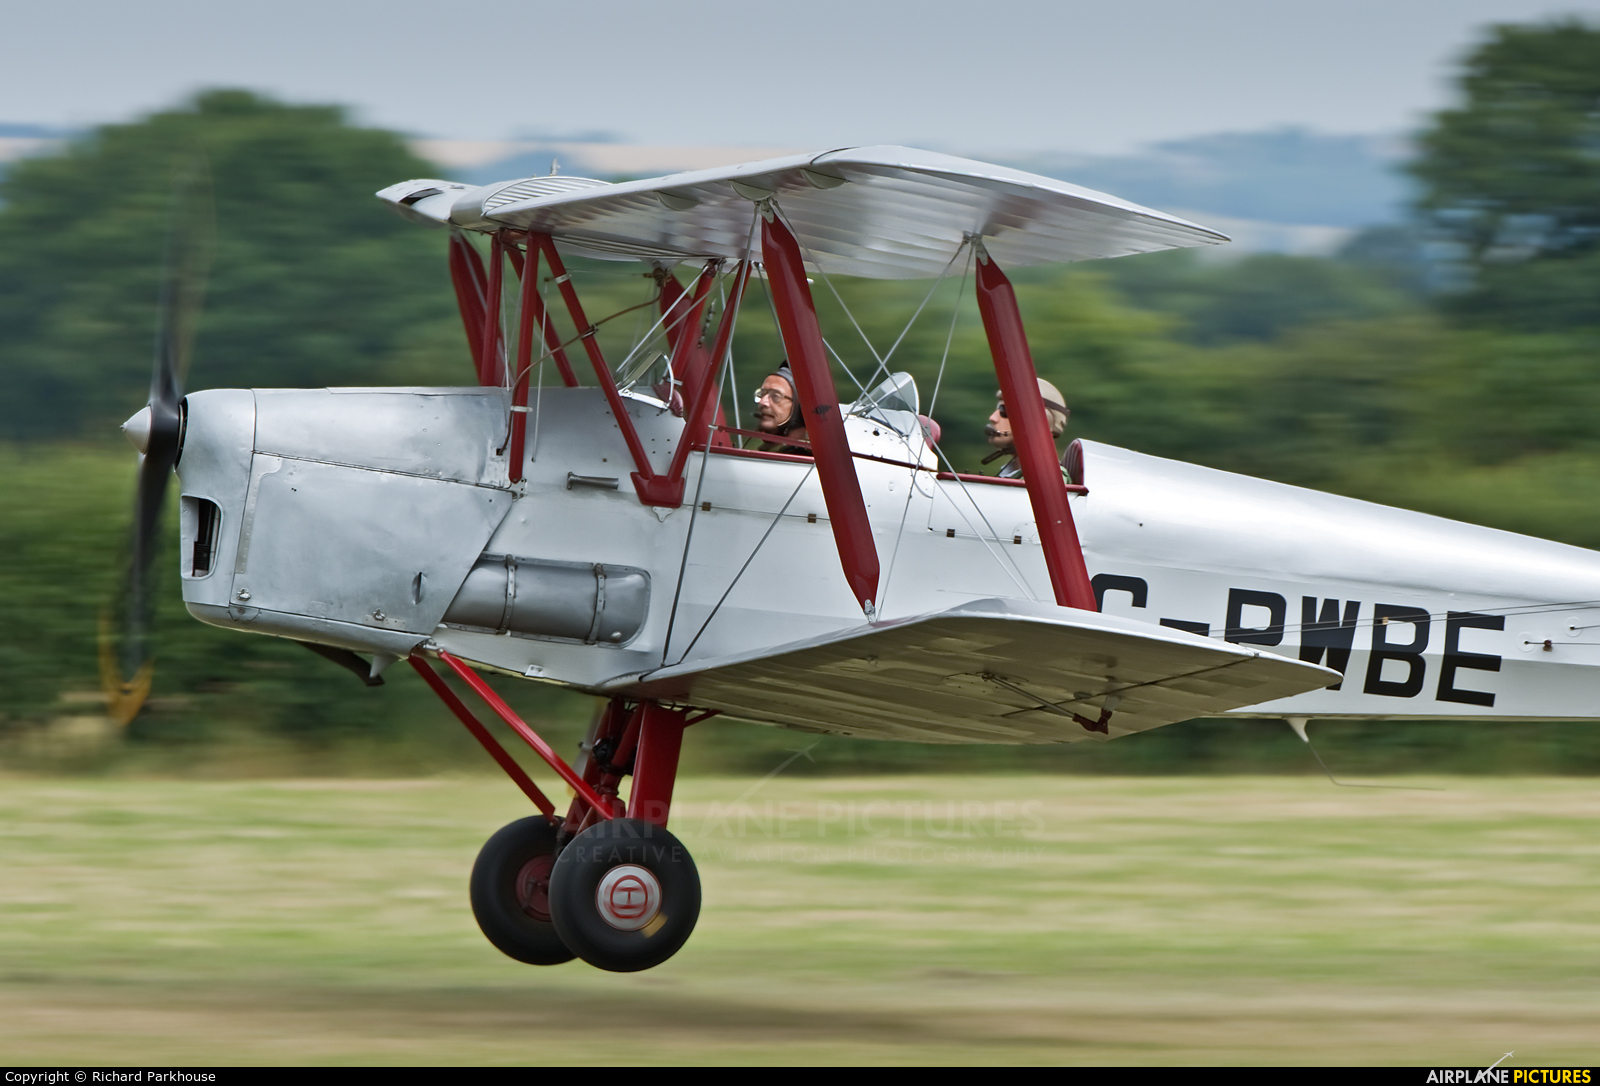 Private G-PWBE aircraft at Lashenden / Headcorn